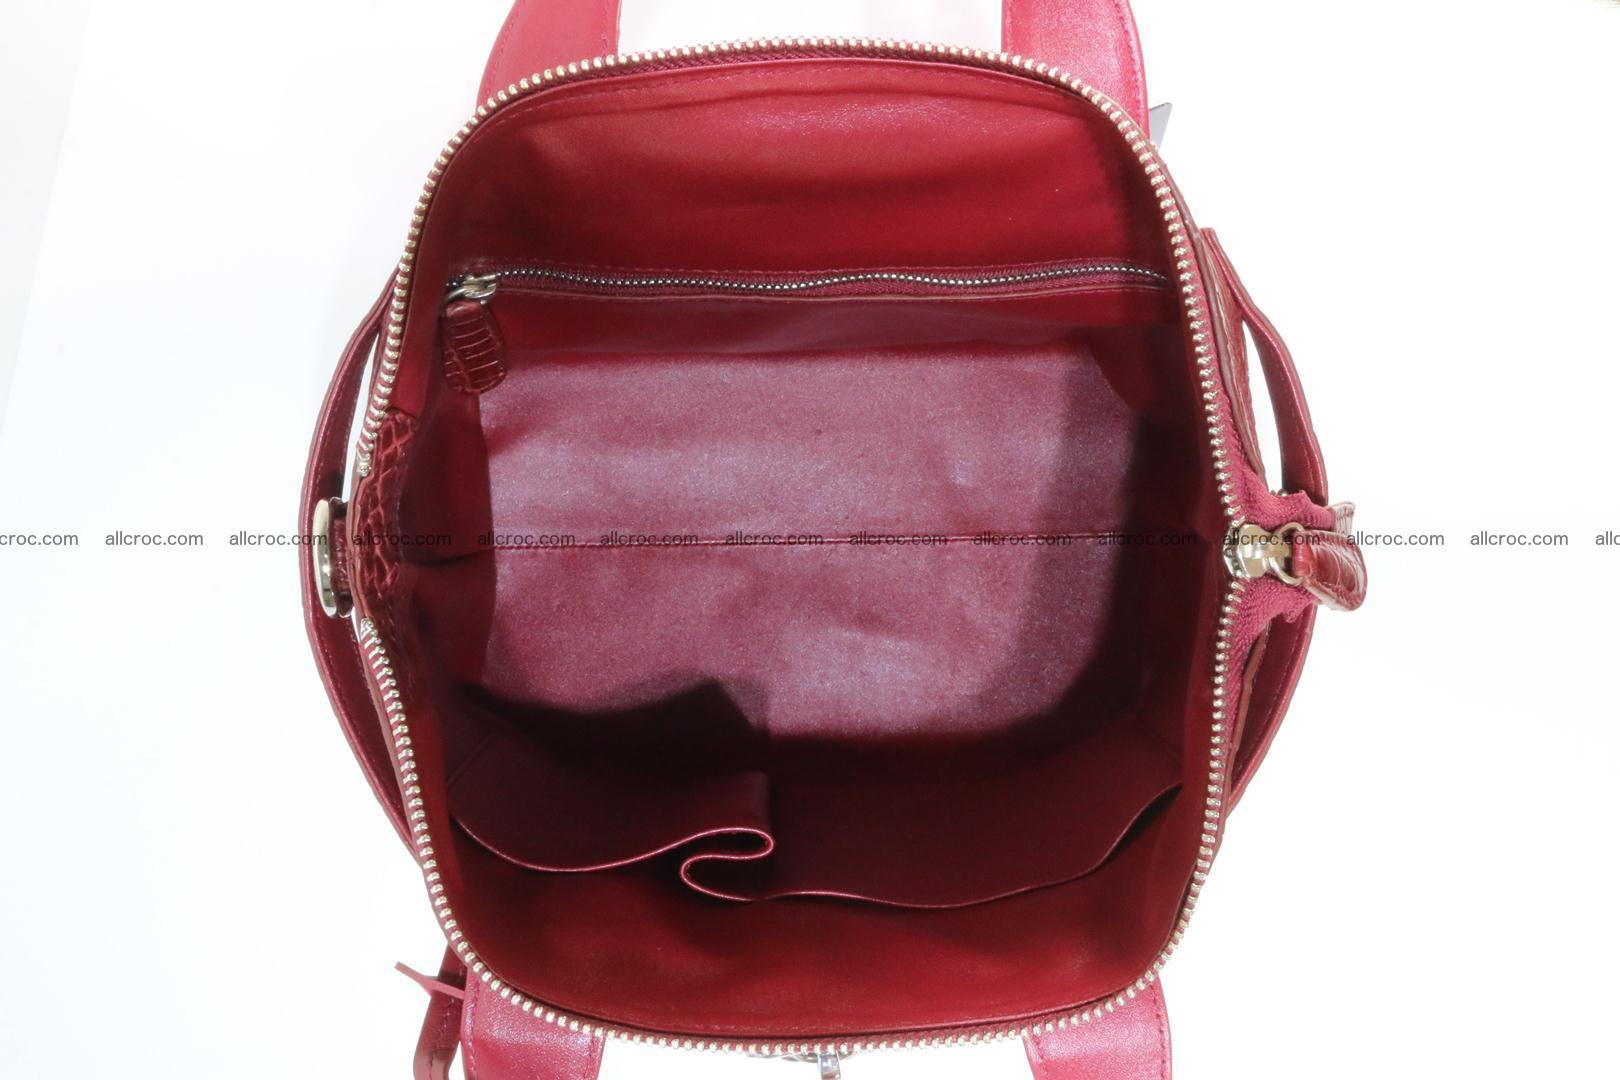 Genuine crocodile handbag for ladies 046 Foto 13